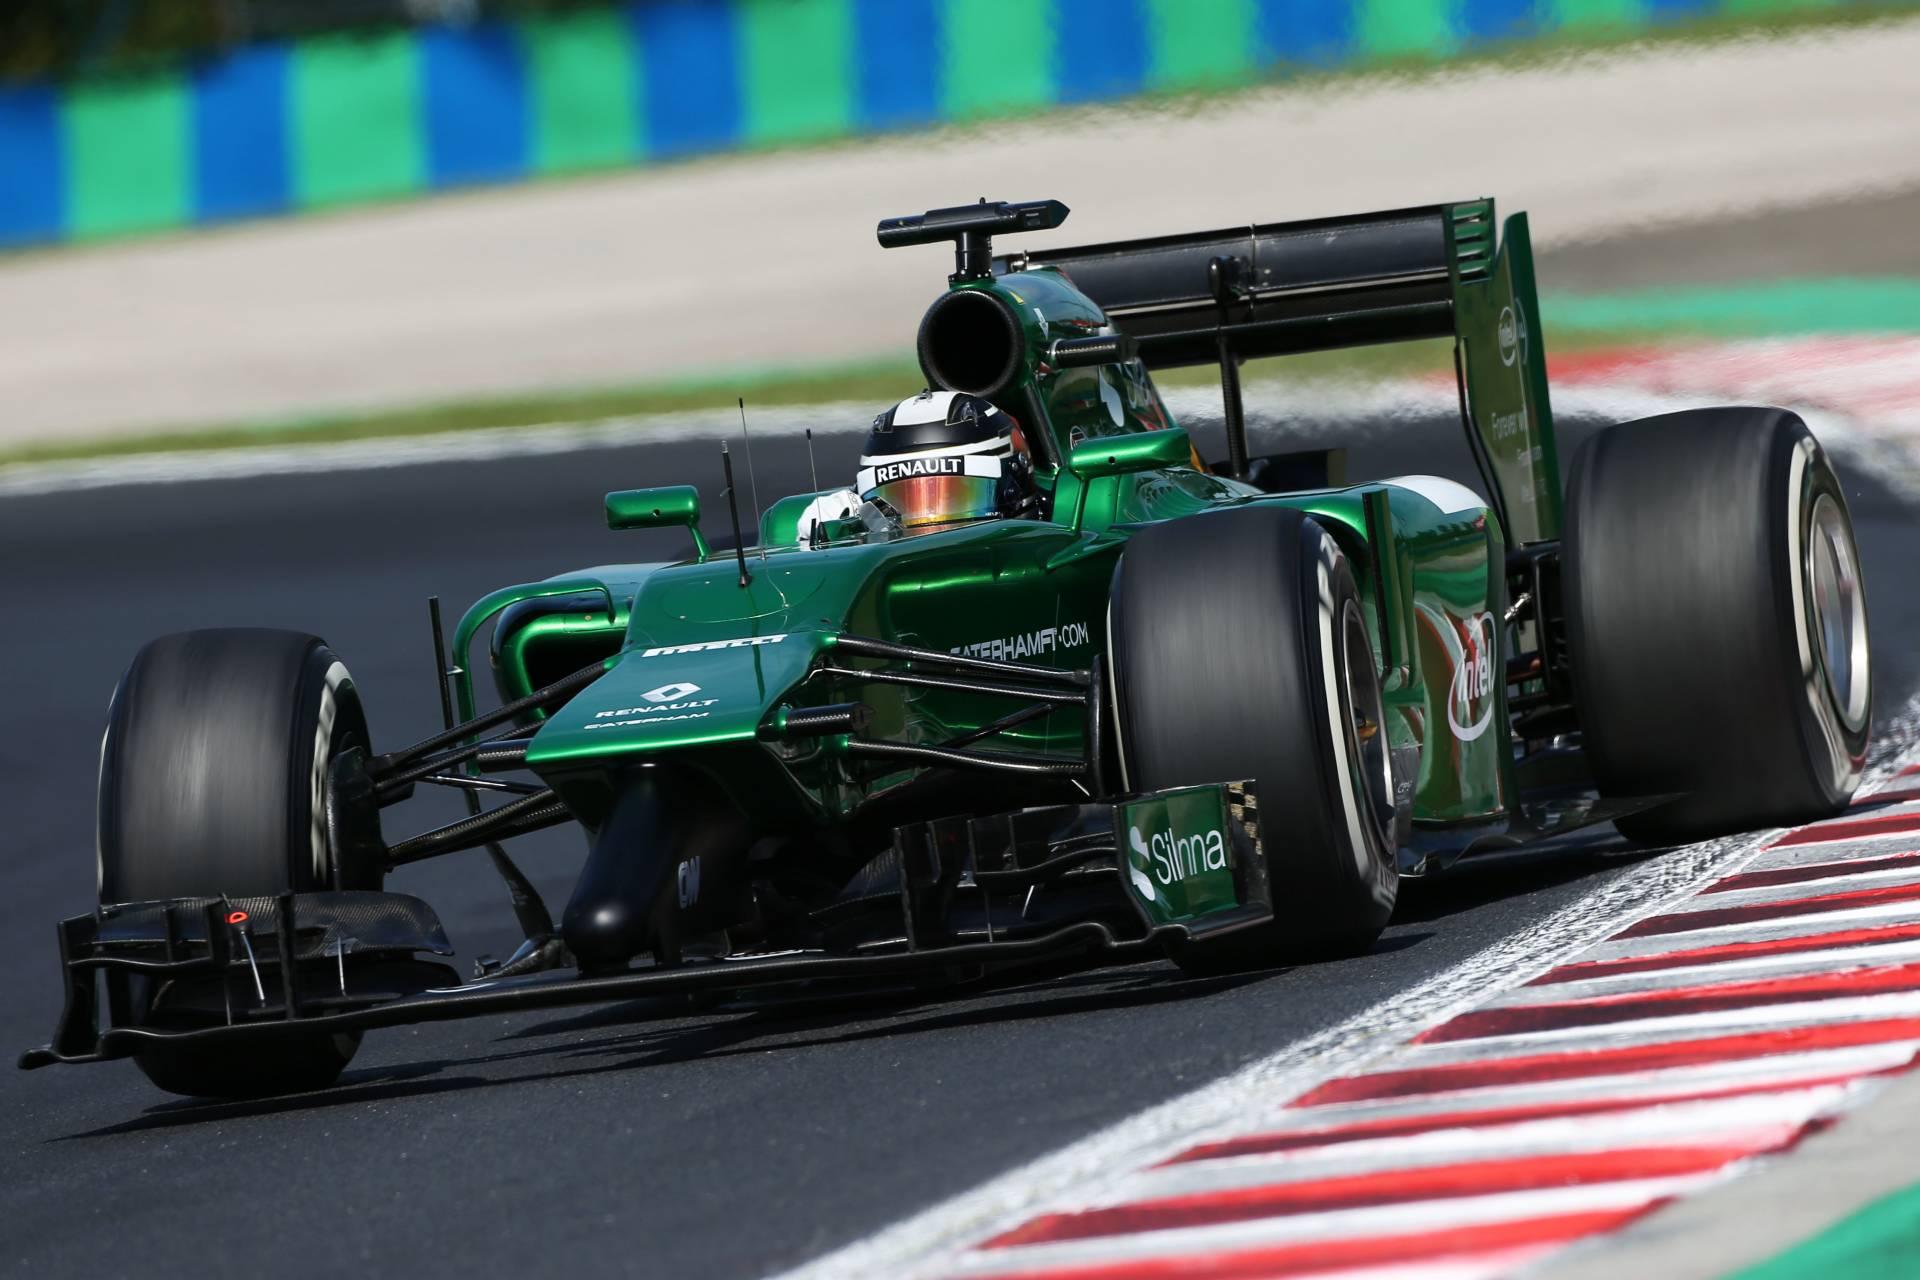 Caterham F1 Teams Background 2